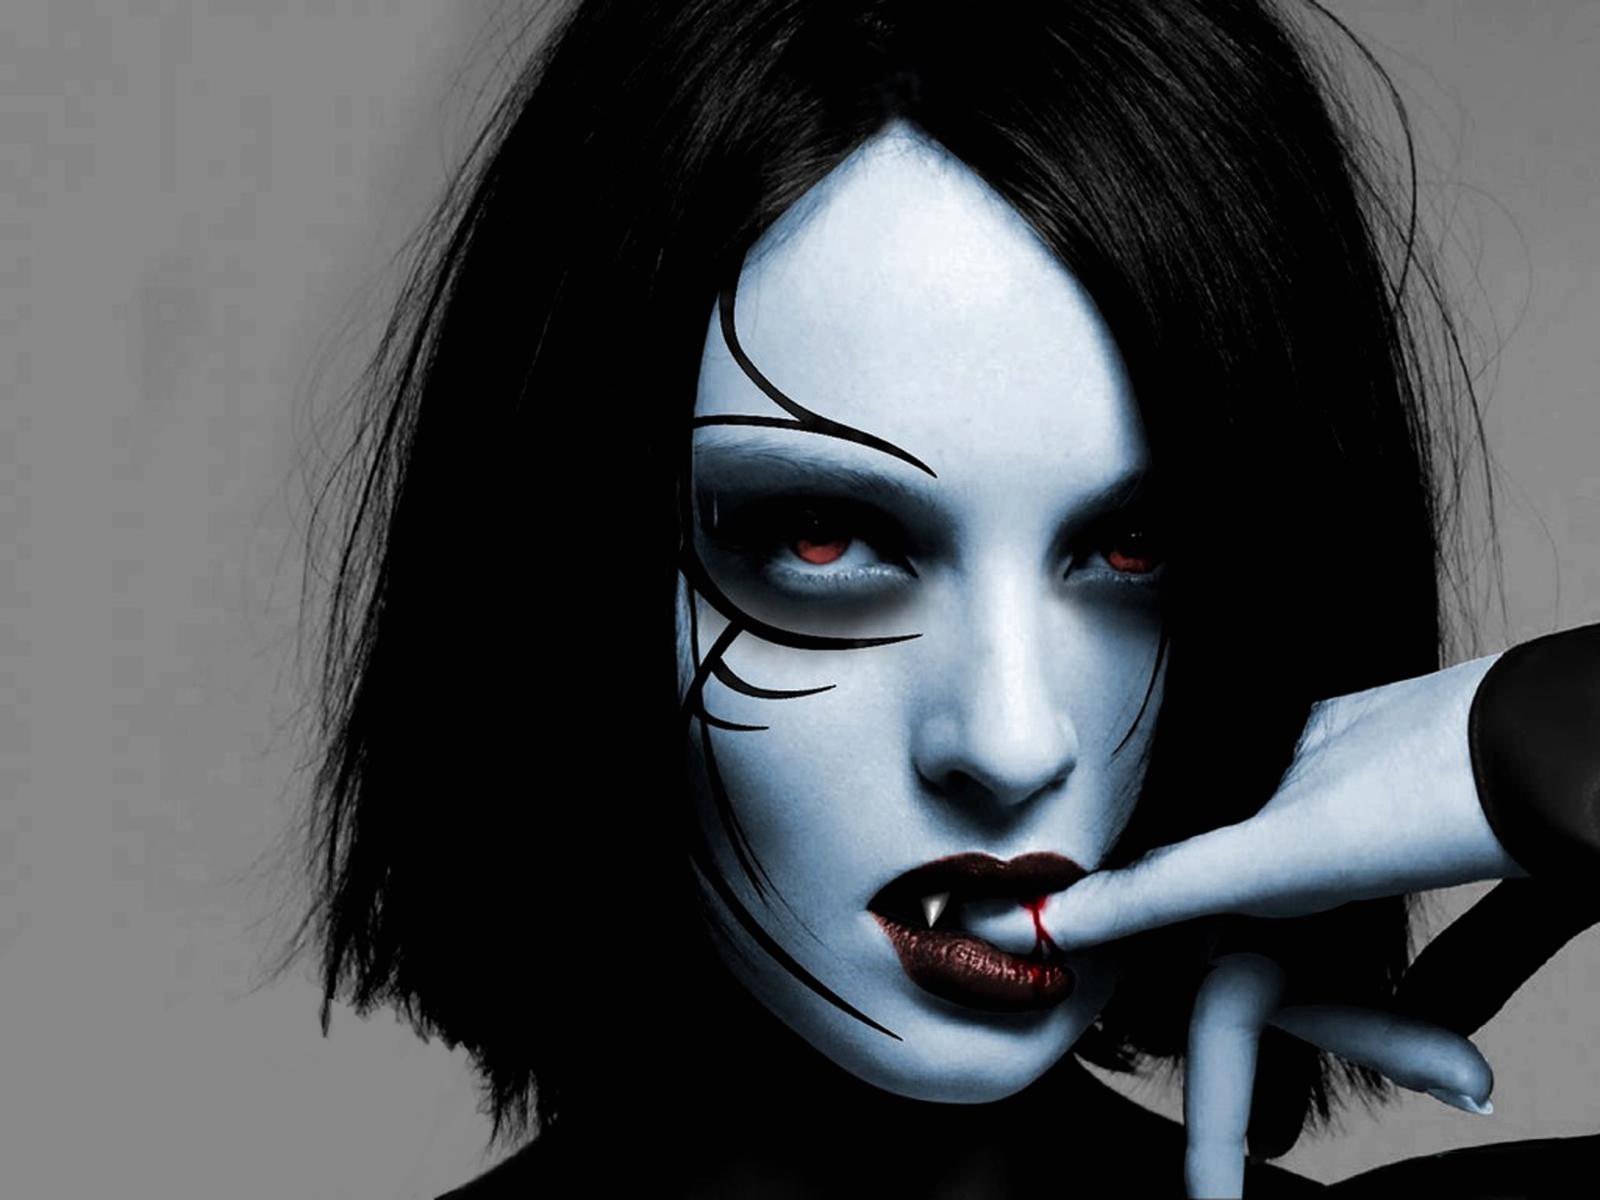 Dark horror evil vampire fantasy gothic women wallpaper 1600x1200 1600x1200